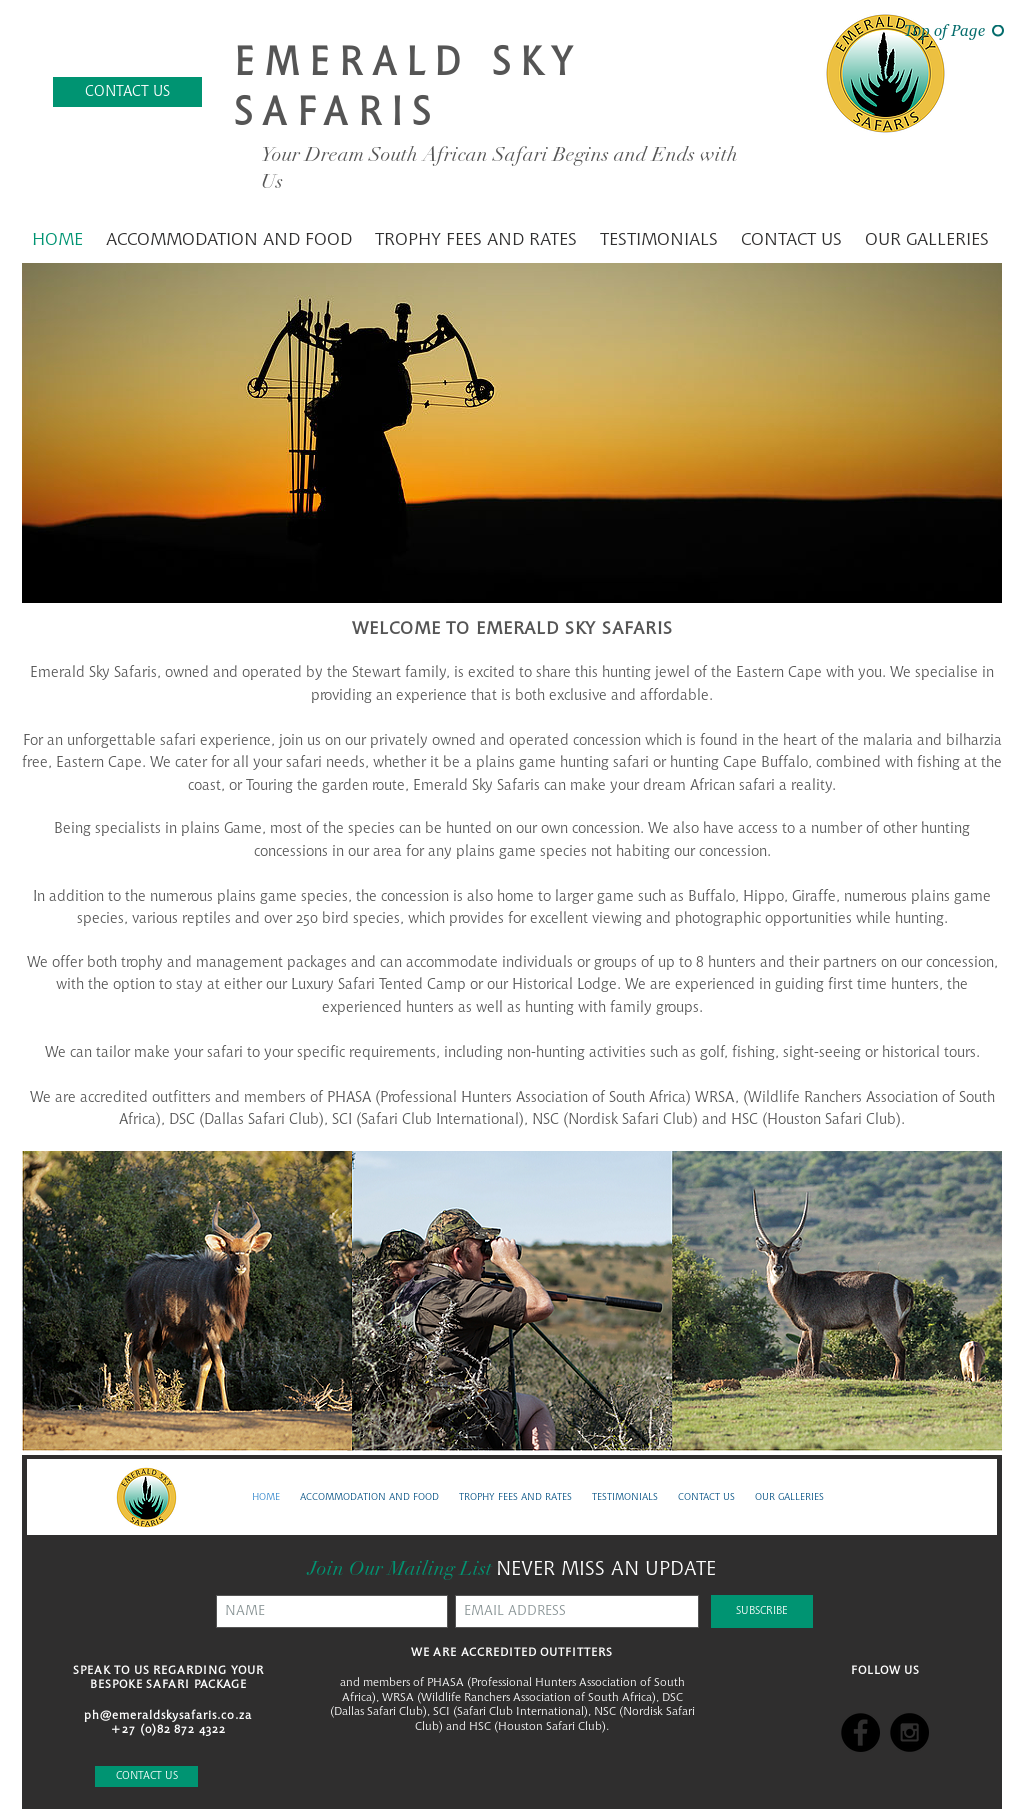 Emerald Sky Safaris Competitors, Revenue and Employees